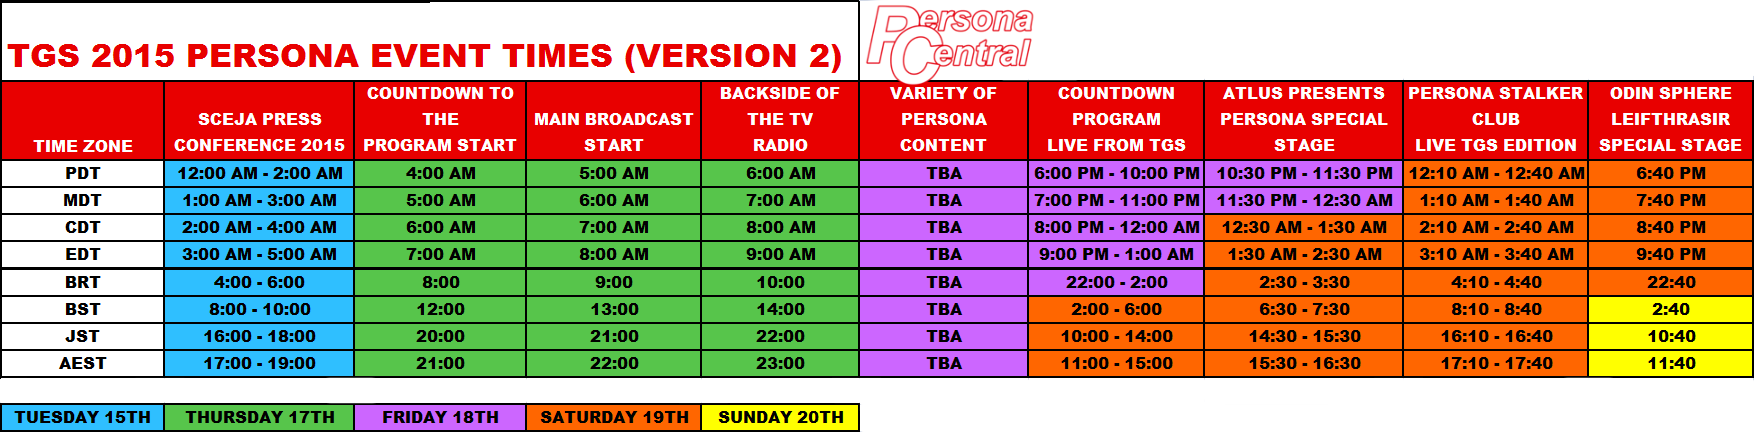 TGS 2015 Schedule Version 2